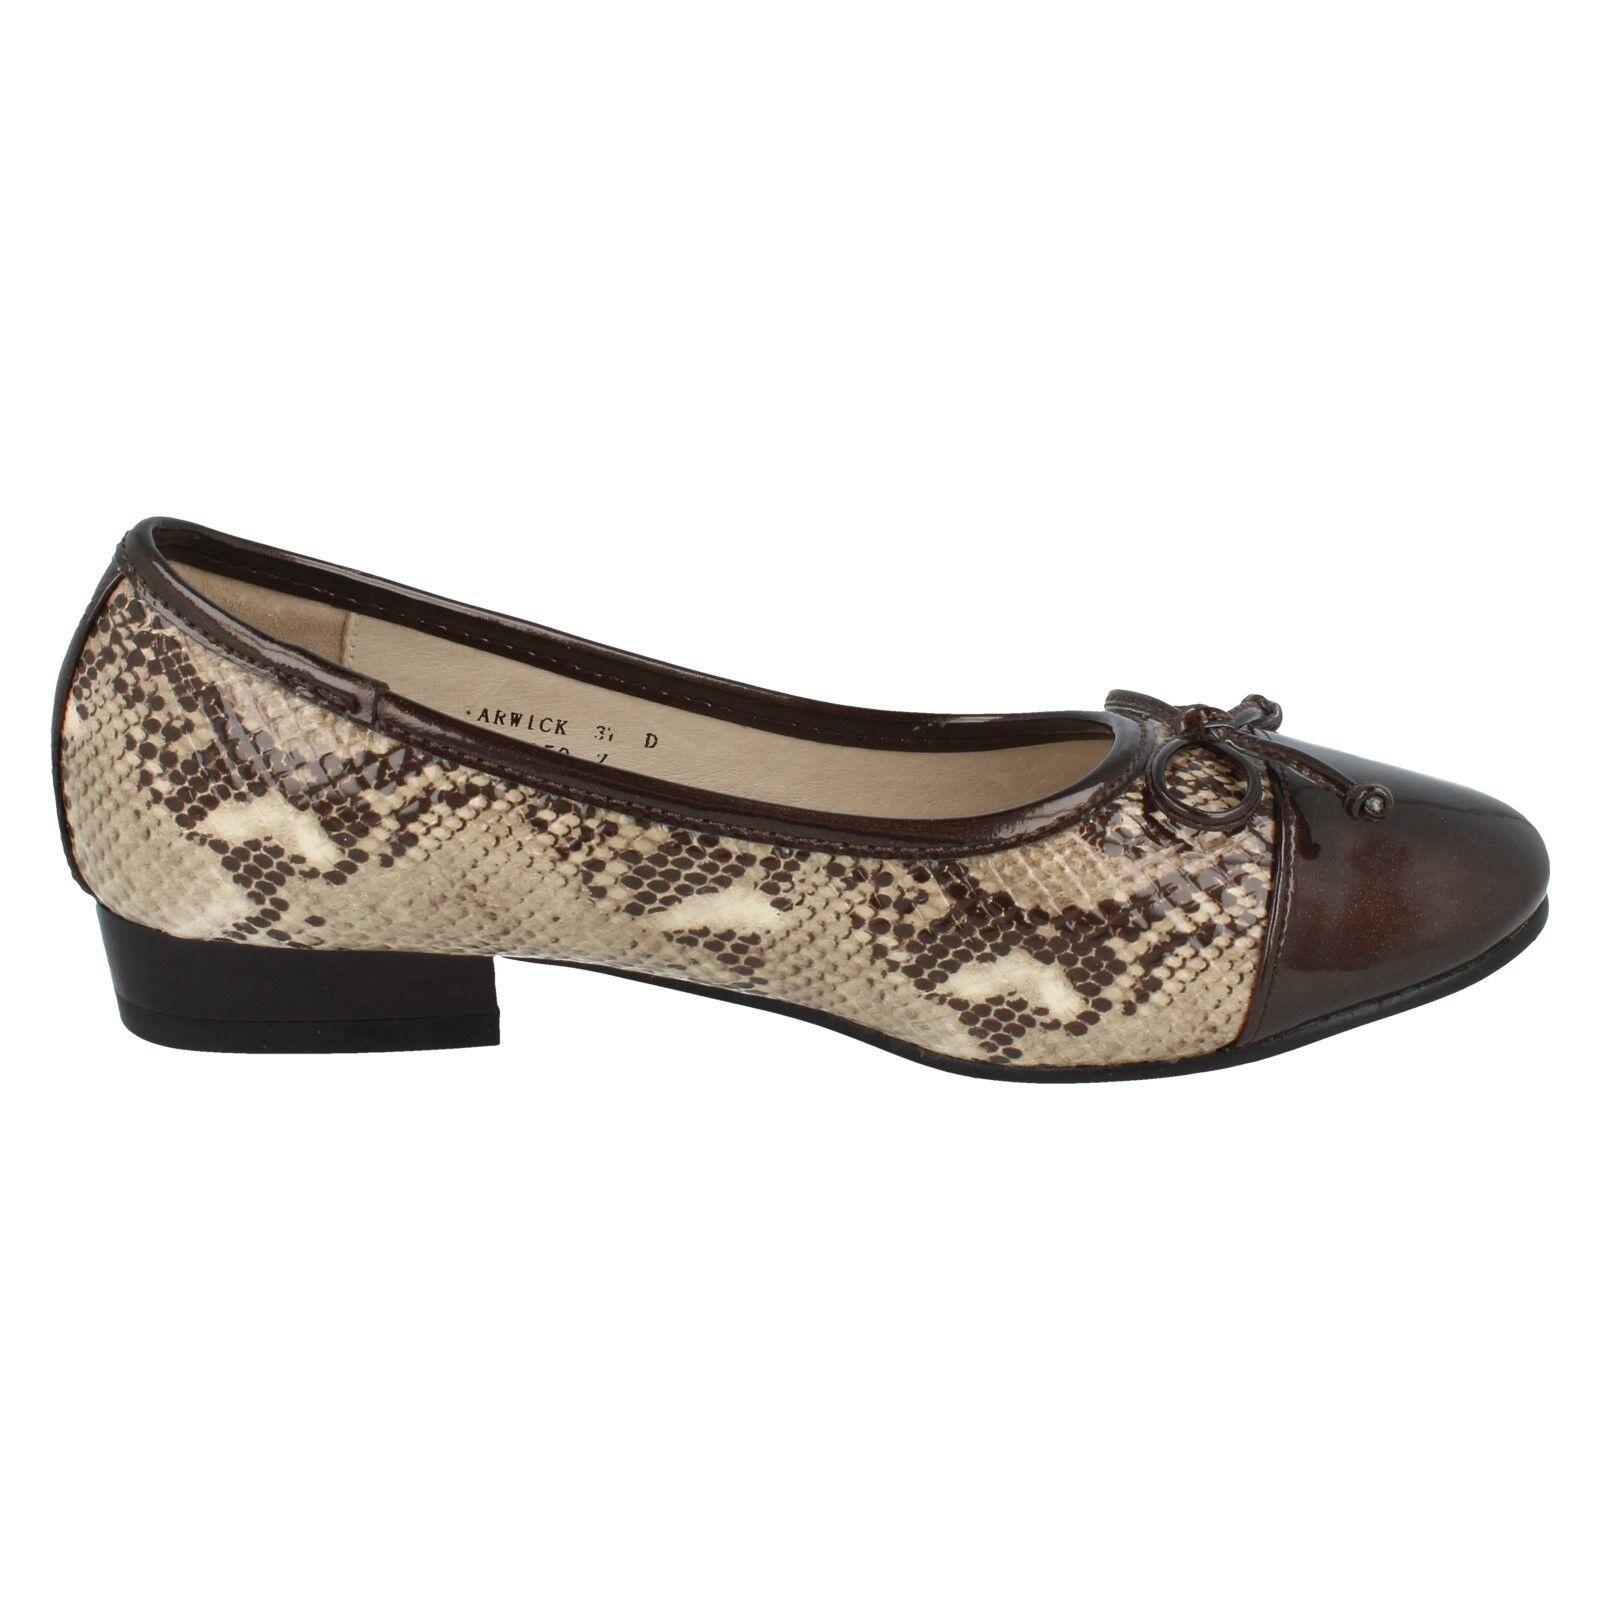 Damen schwarz/Bronze Balletschuhe ohne Bügel Van Dal Balletschuhe schwarz/Bronze Warwick e5ec74